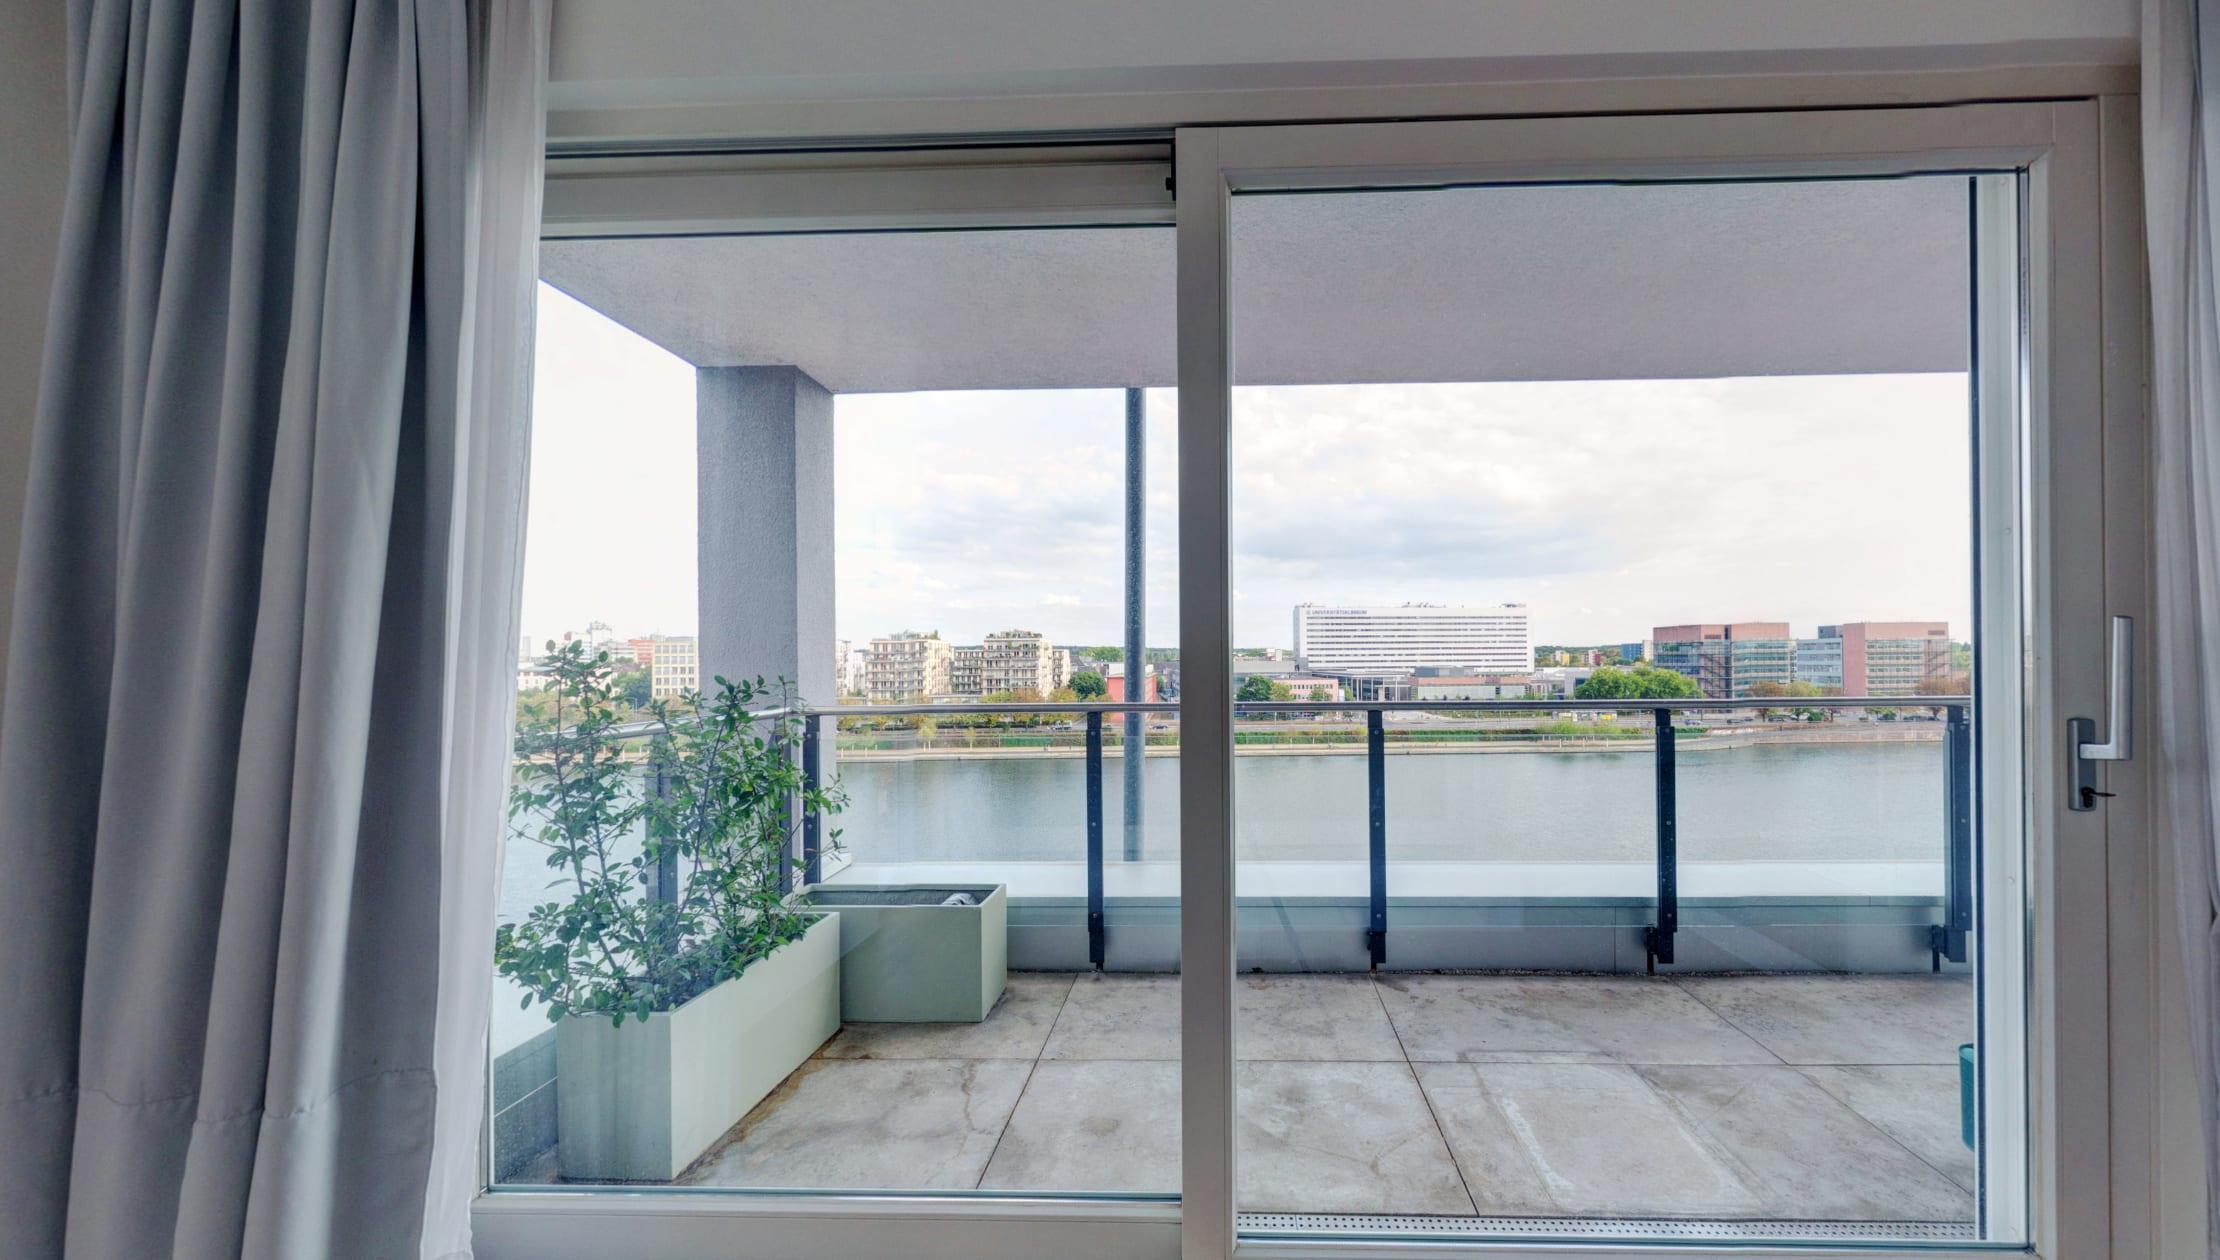 Immobilie Frankfurt Mainwesthafen 360 Grad Rundgang